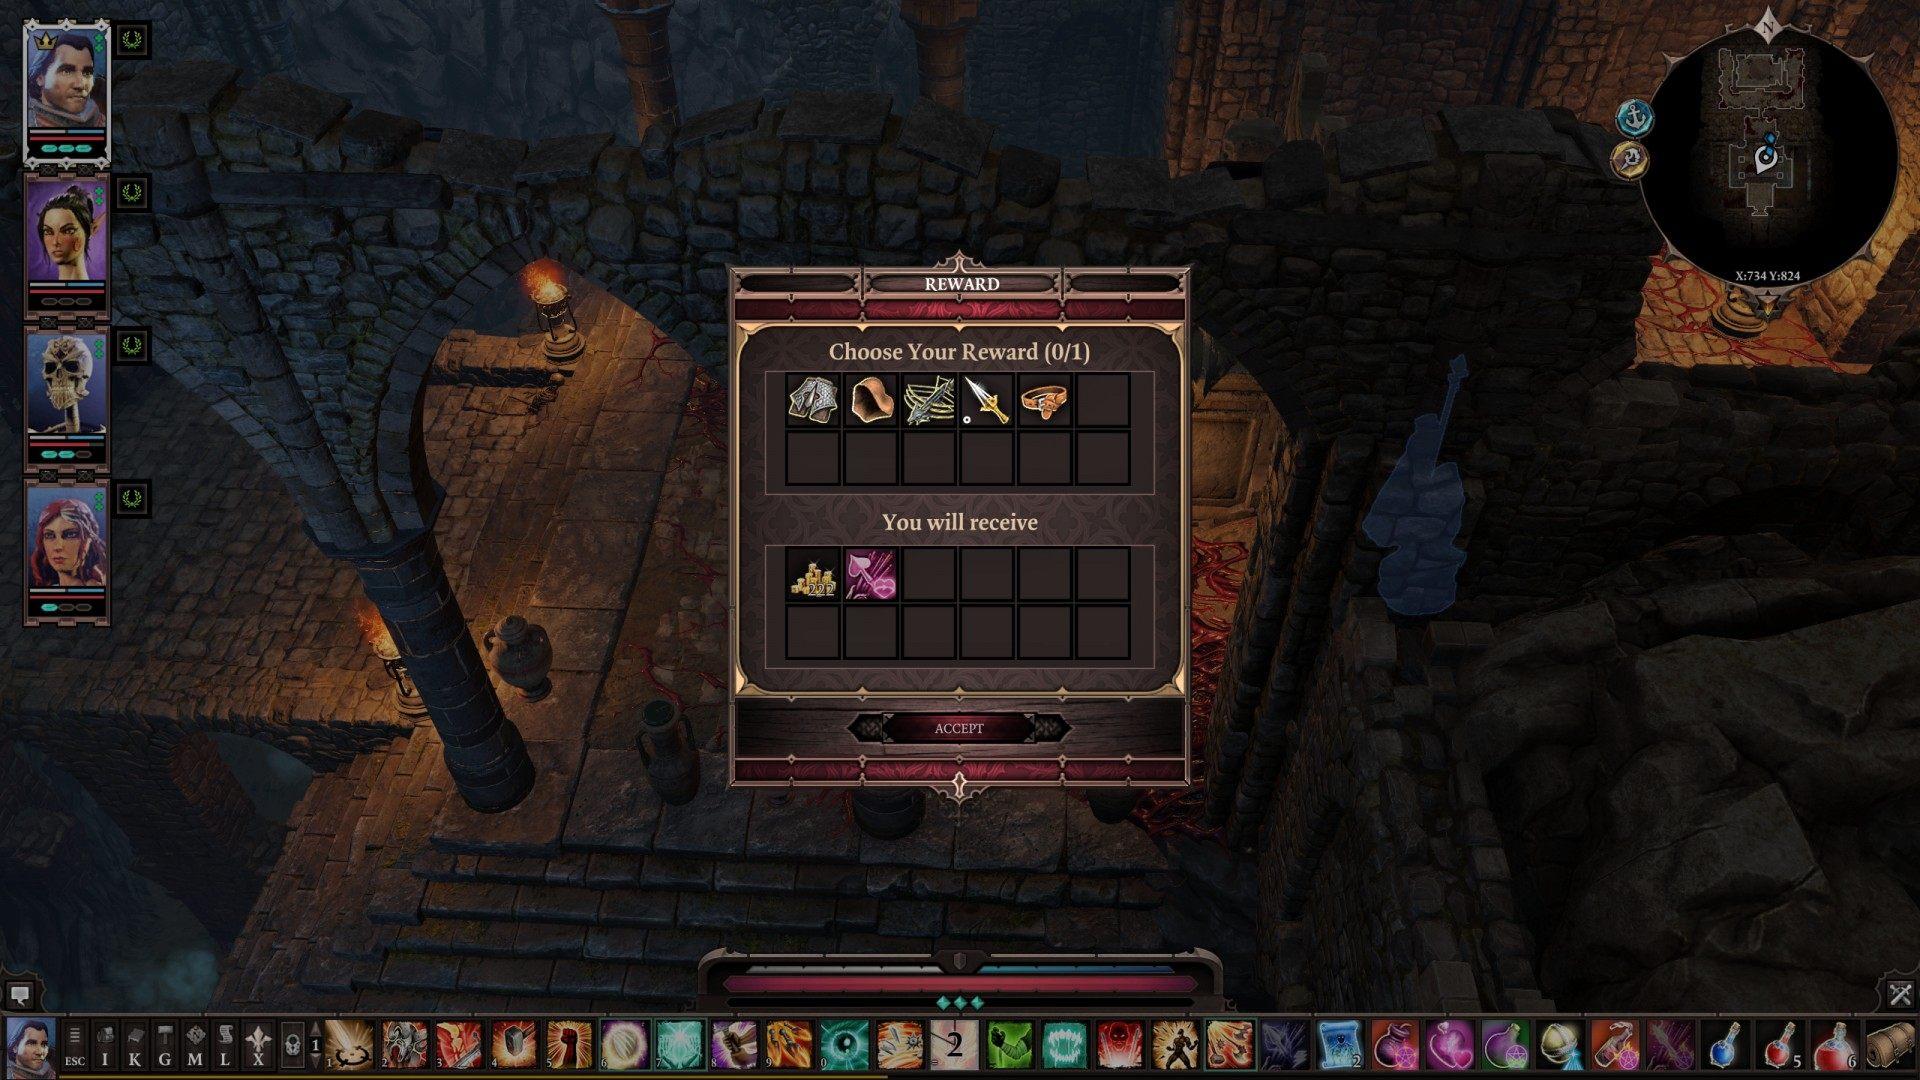 Divinity original sin 2 undead guide